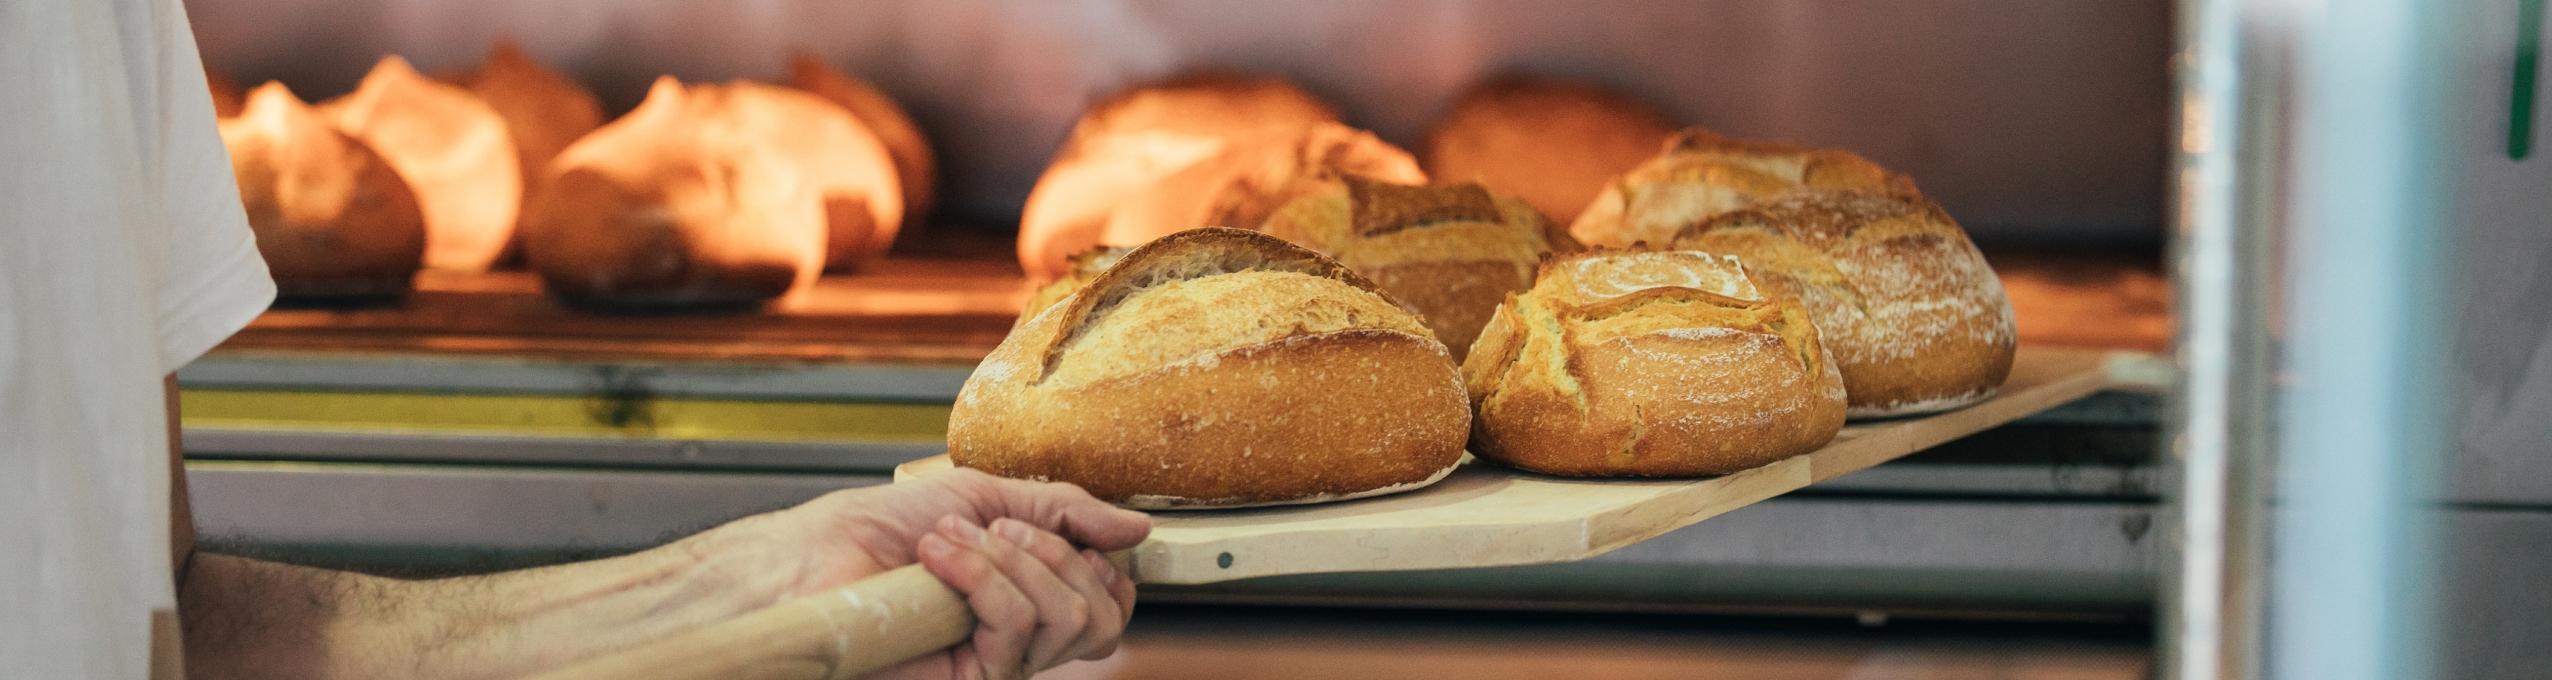 Bakery bread.